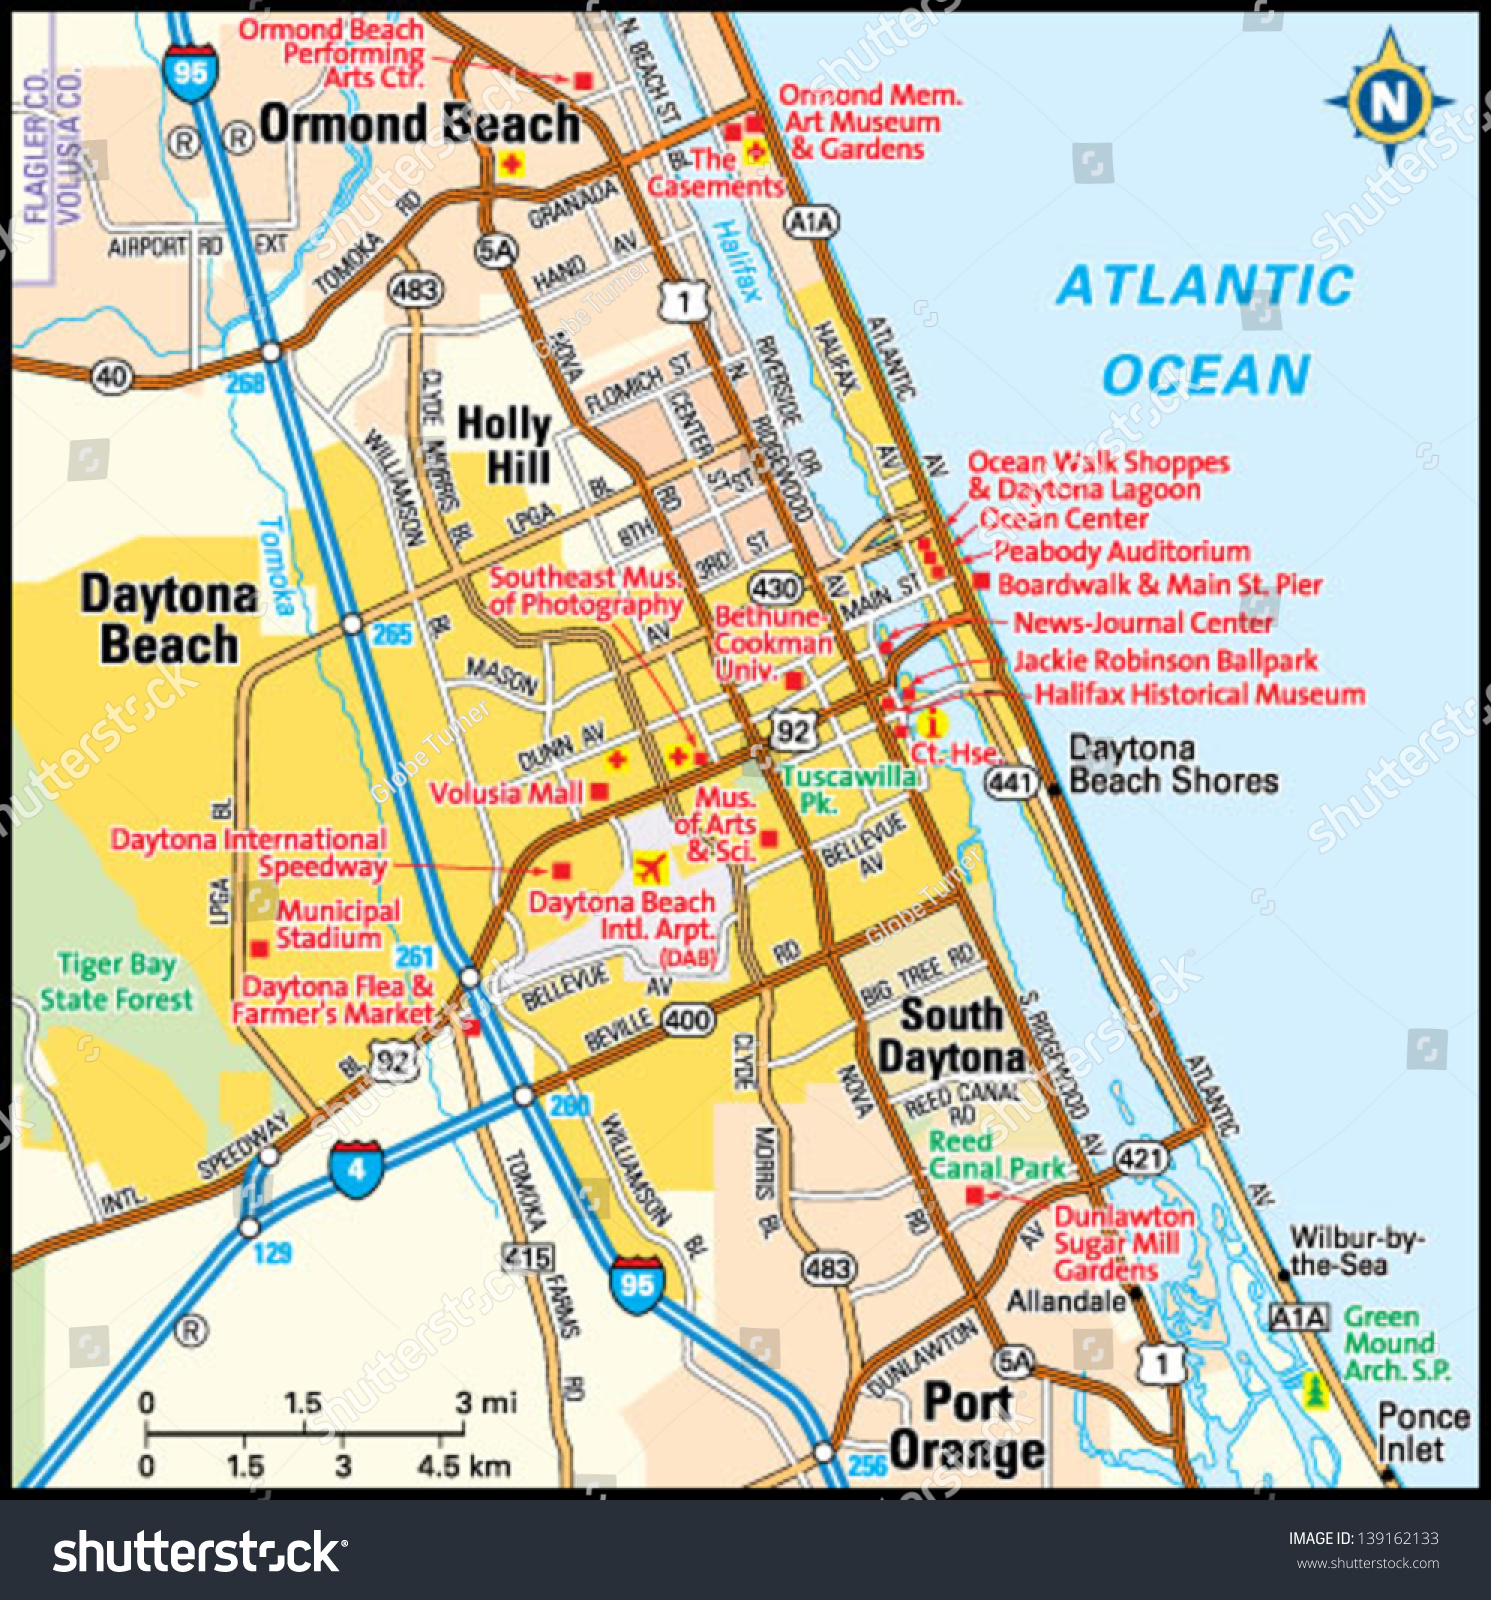 South Daytona Florida: Daytona Beach Florida Area Map Stock Vector 139162133